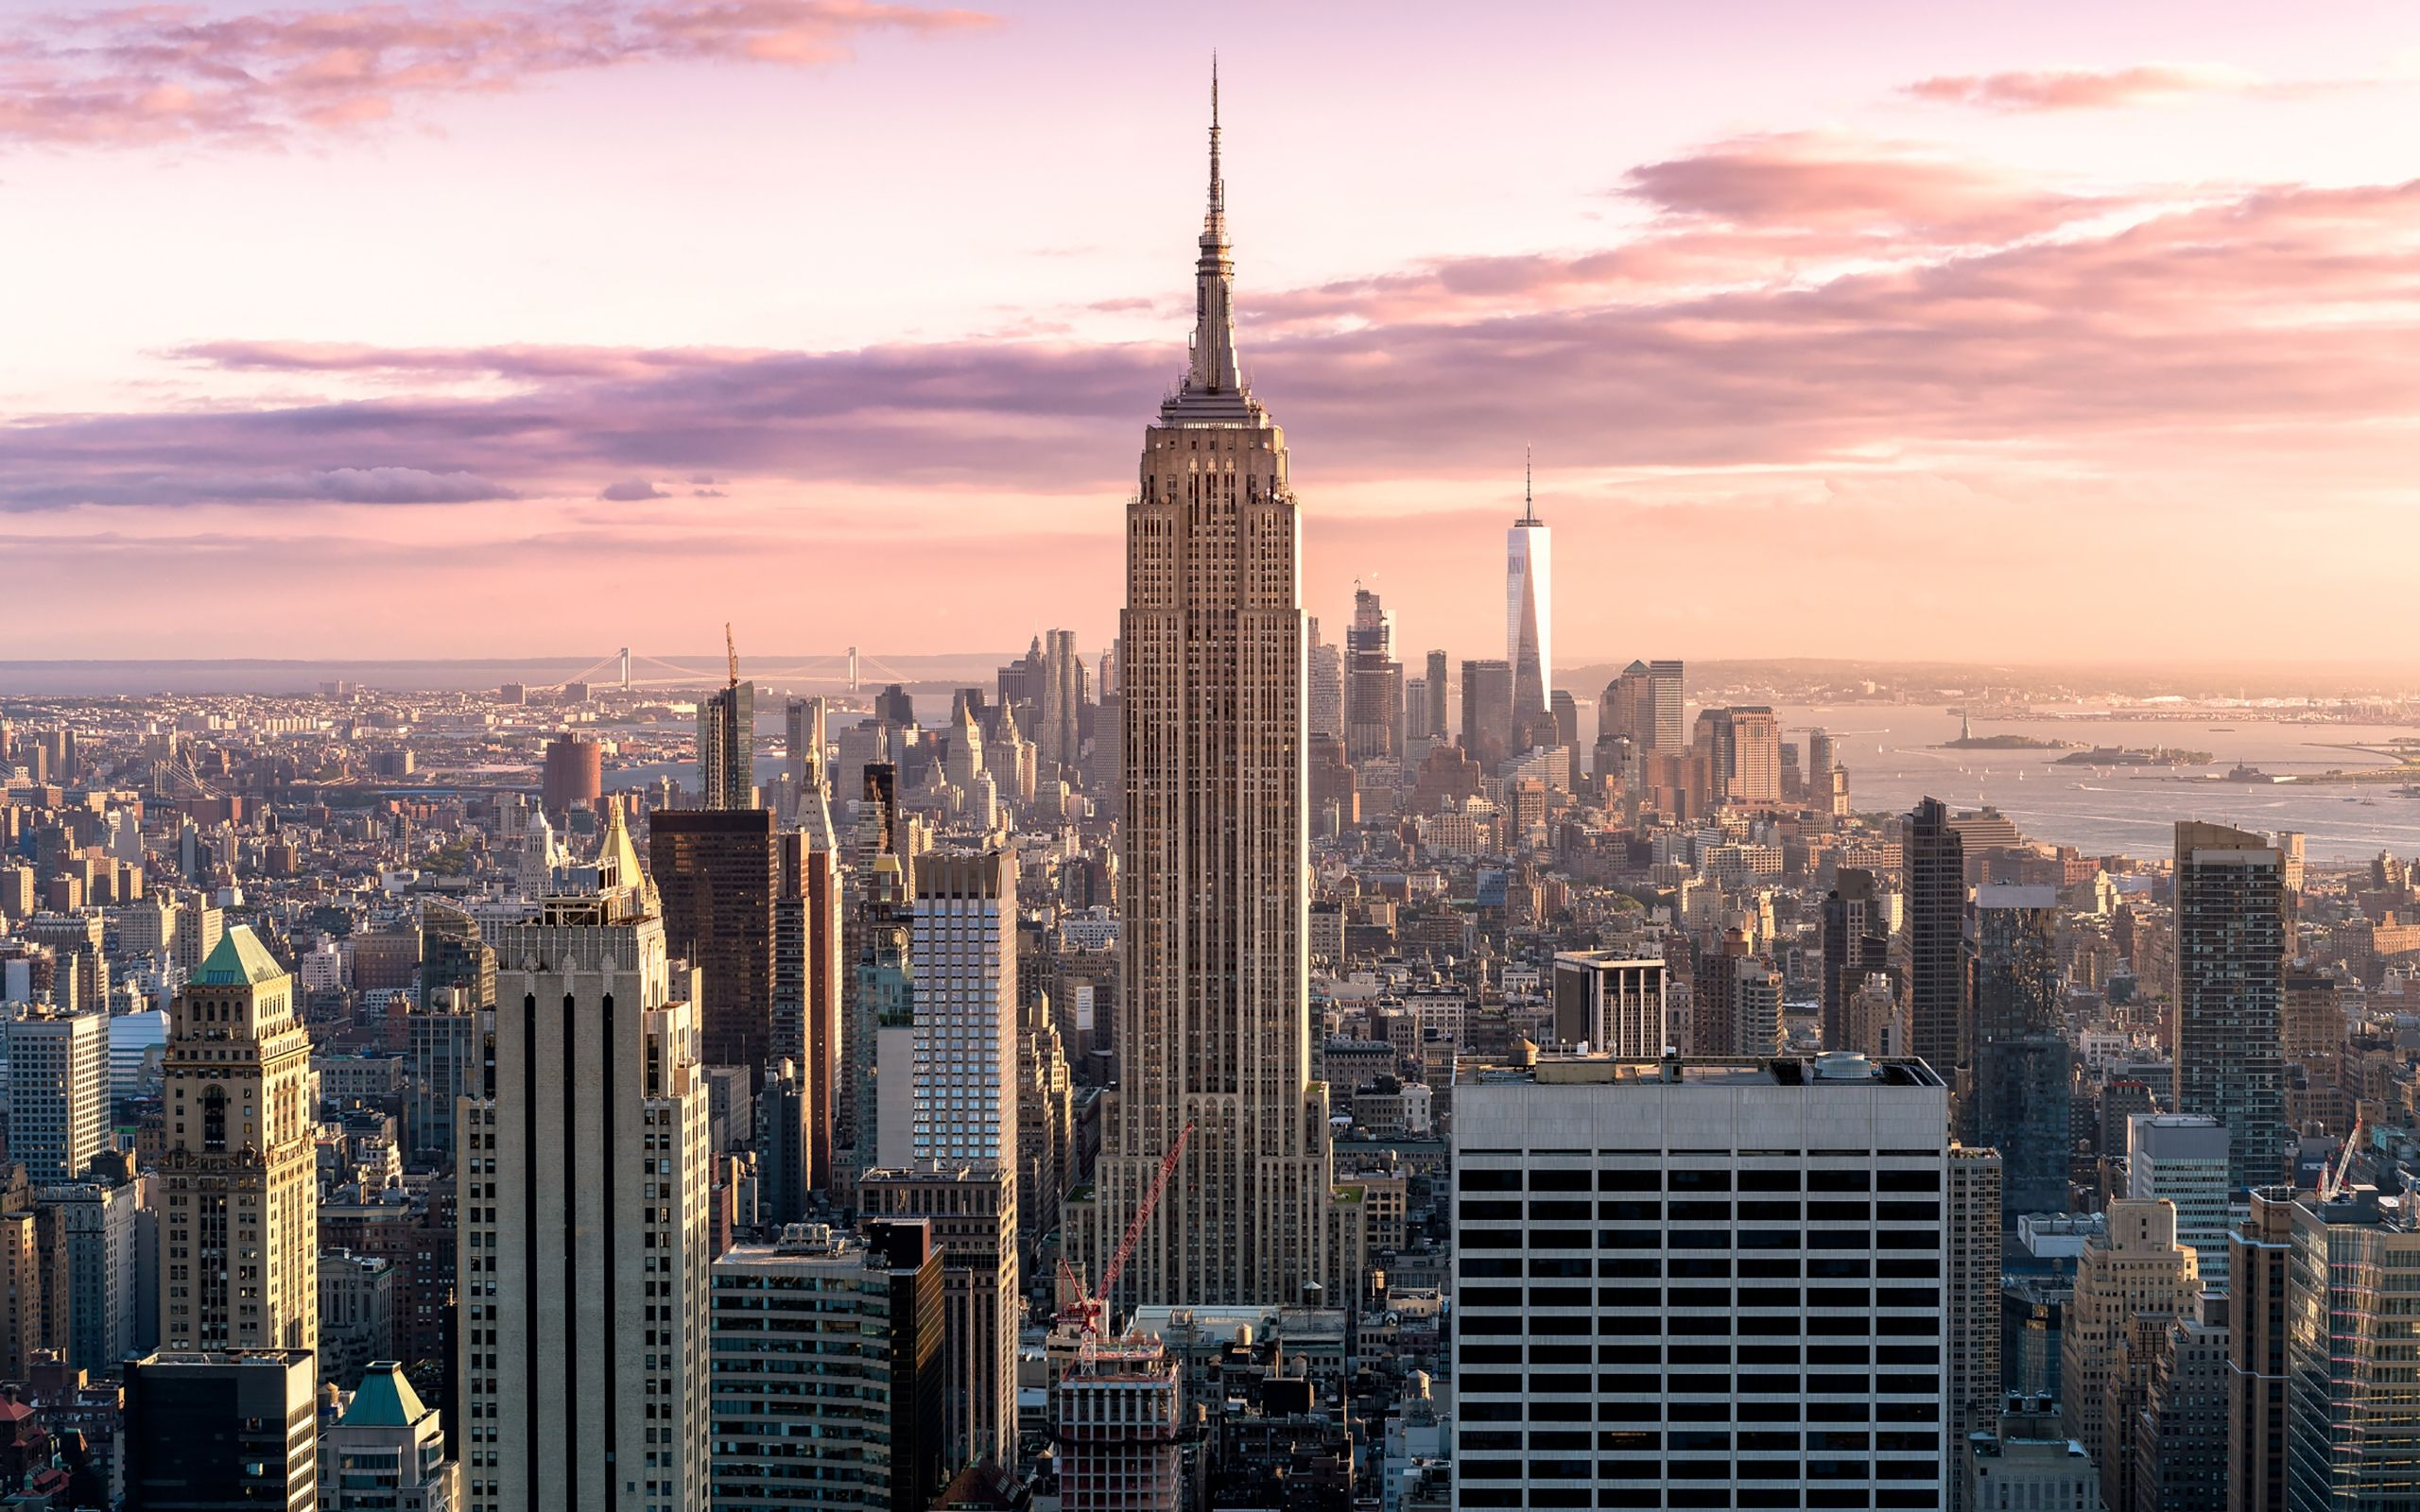 Usa Manhattan Skyscrapers Top View Buildings New York City In 2021 New York City Pictures Top View Building Skyline